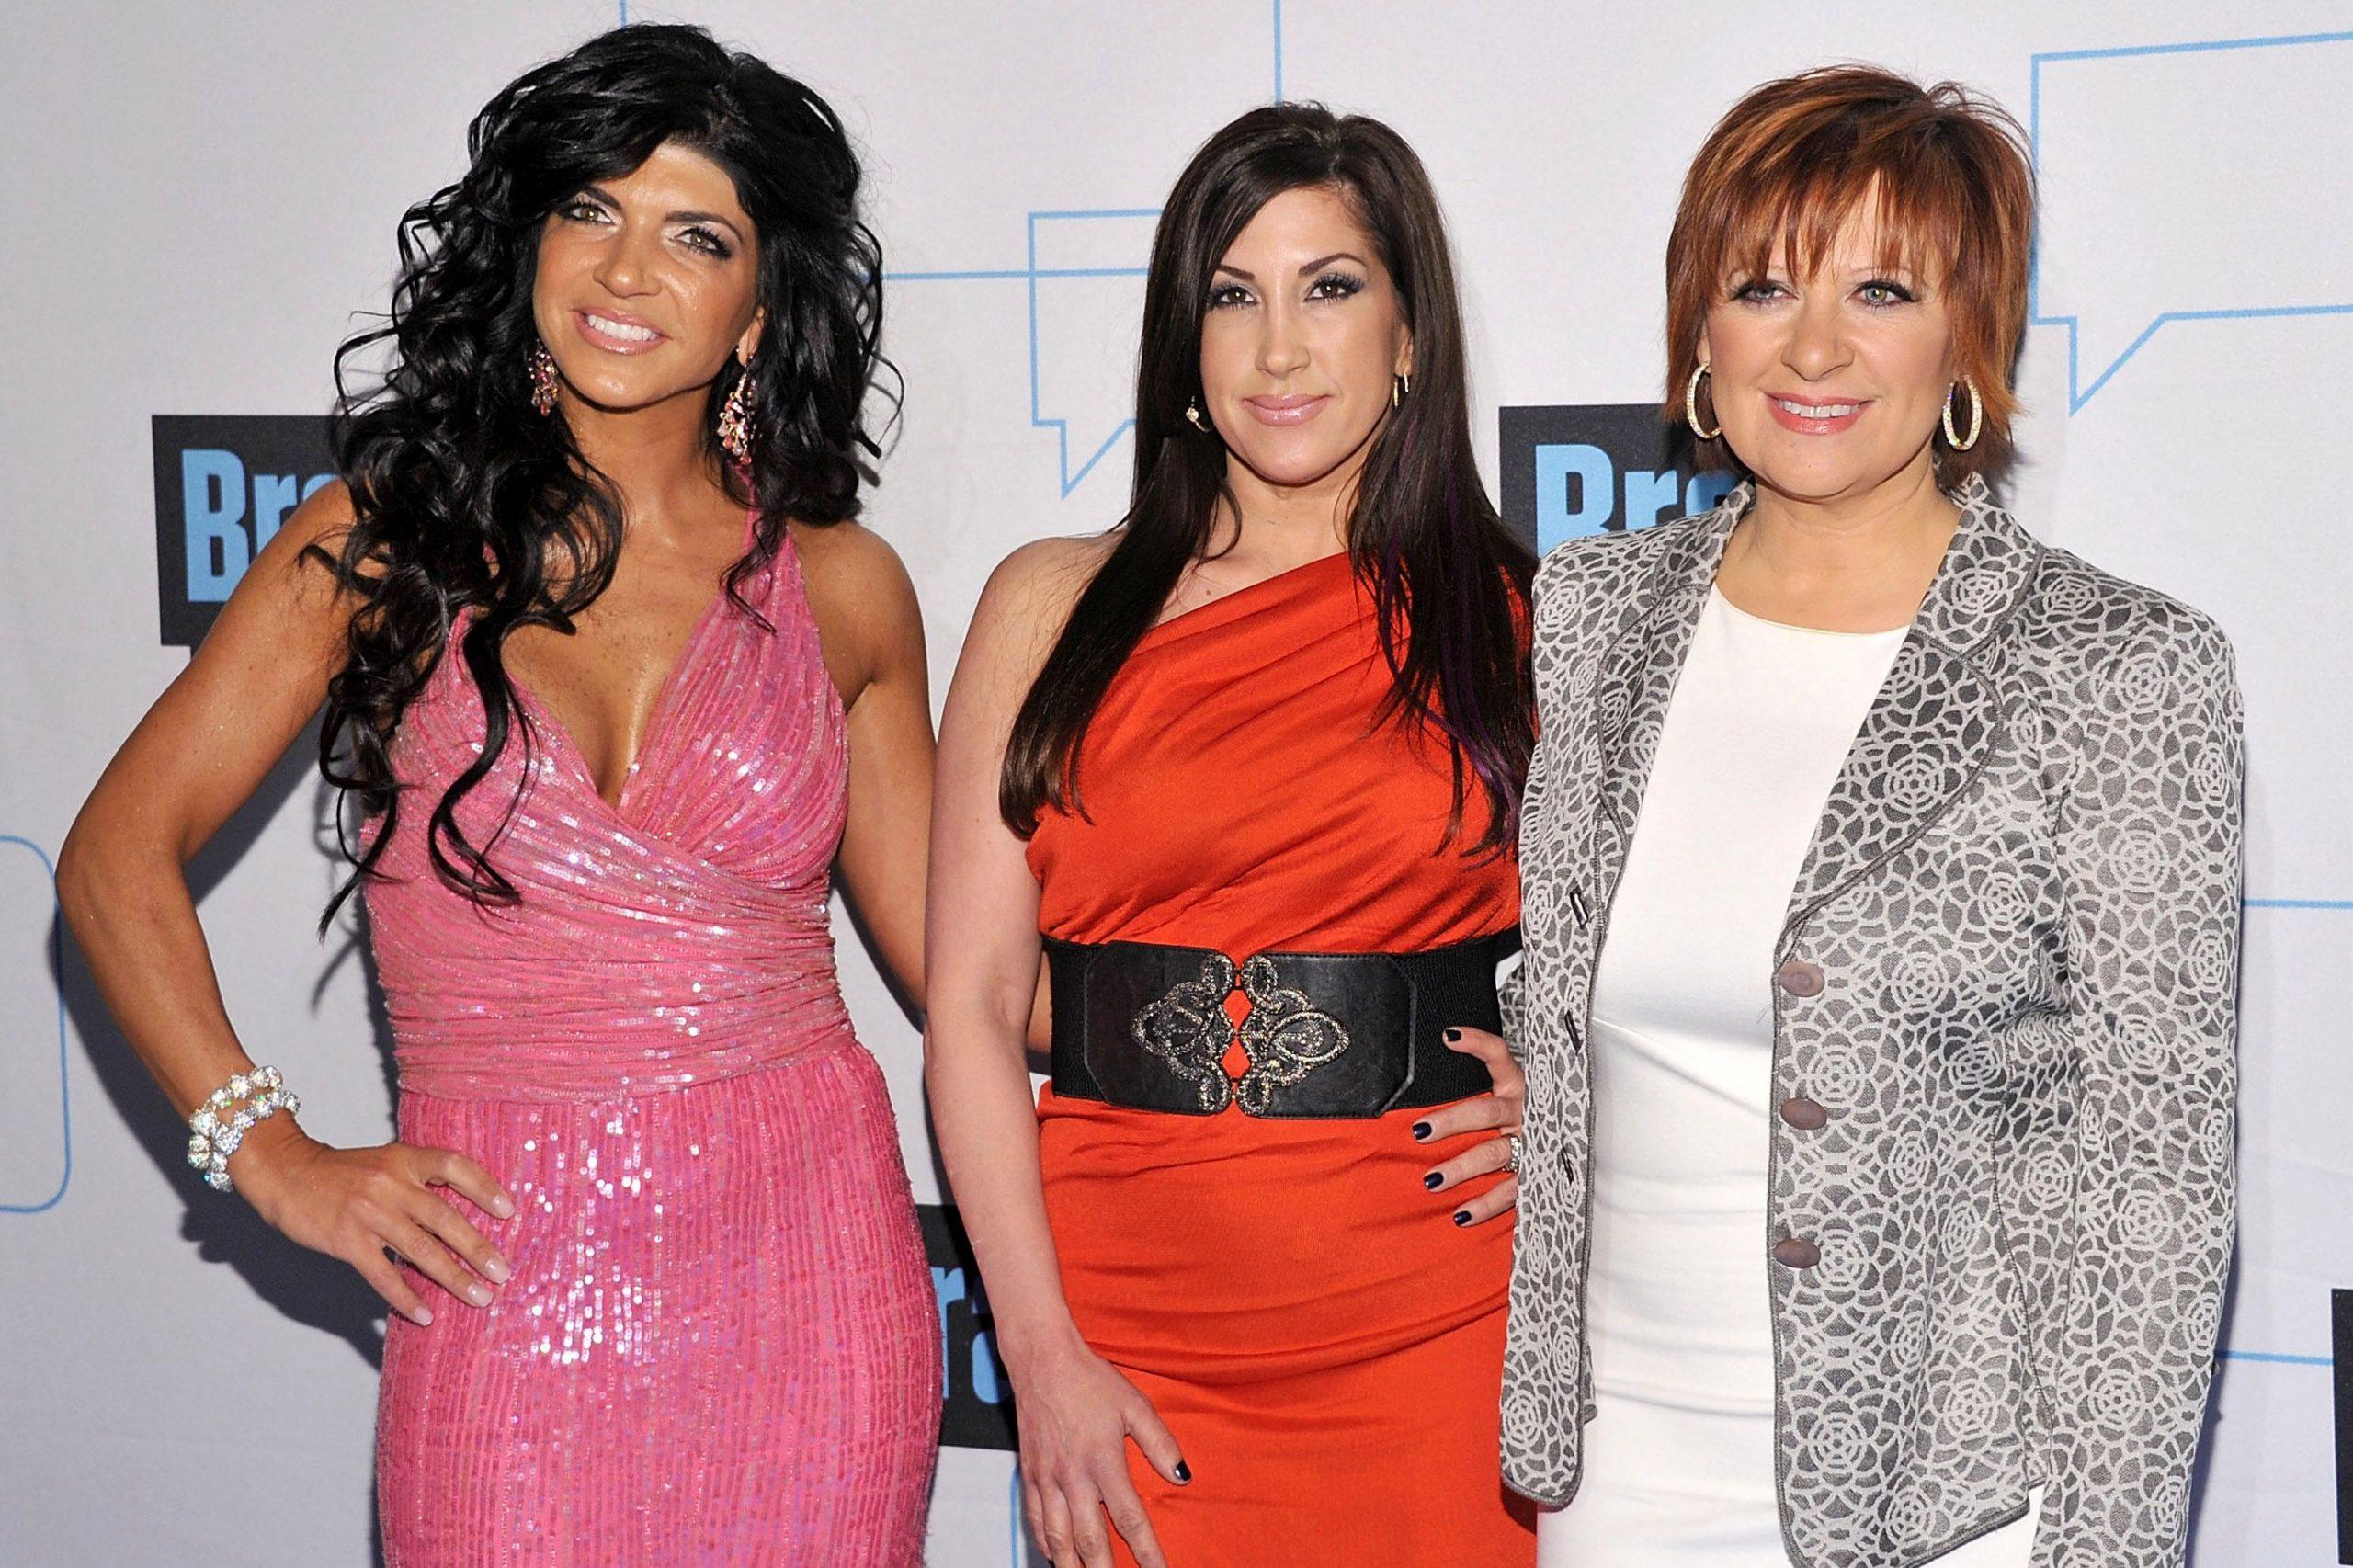 Teresa Giudice, Jacqueline Laurita, Caroline Manzo, The Real Housewives of New Jersey, RHONJ